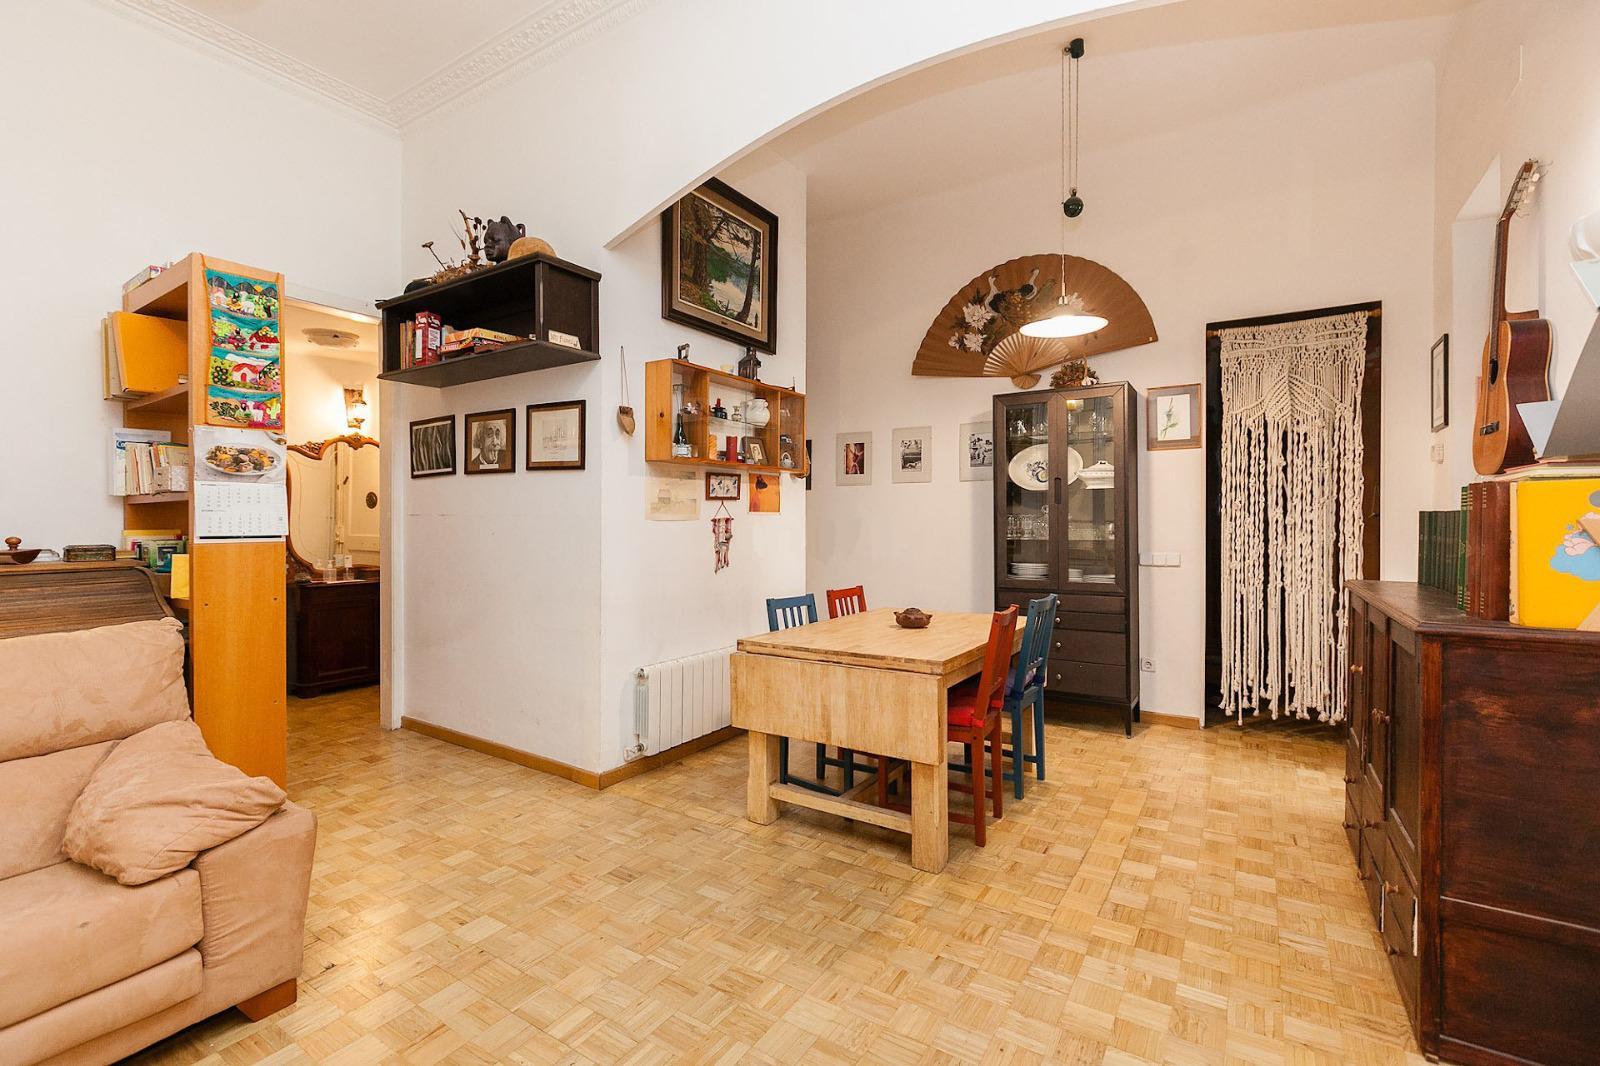 247916 Flat for sale in Sarrià-Sant Gervasi, Sant Gervasi-Galvany 2